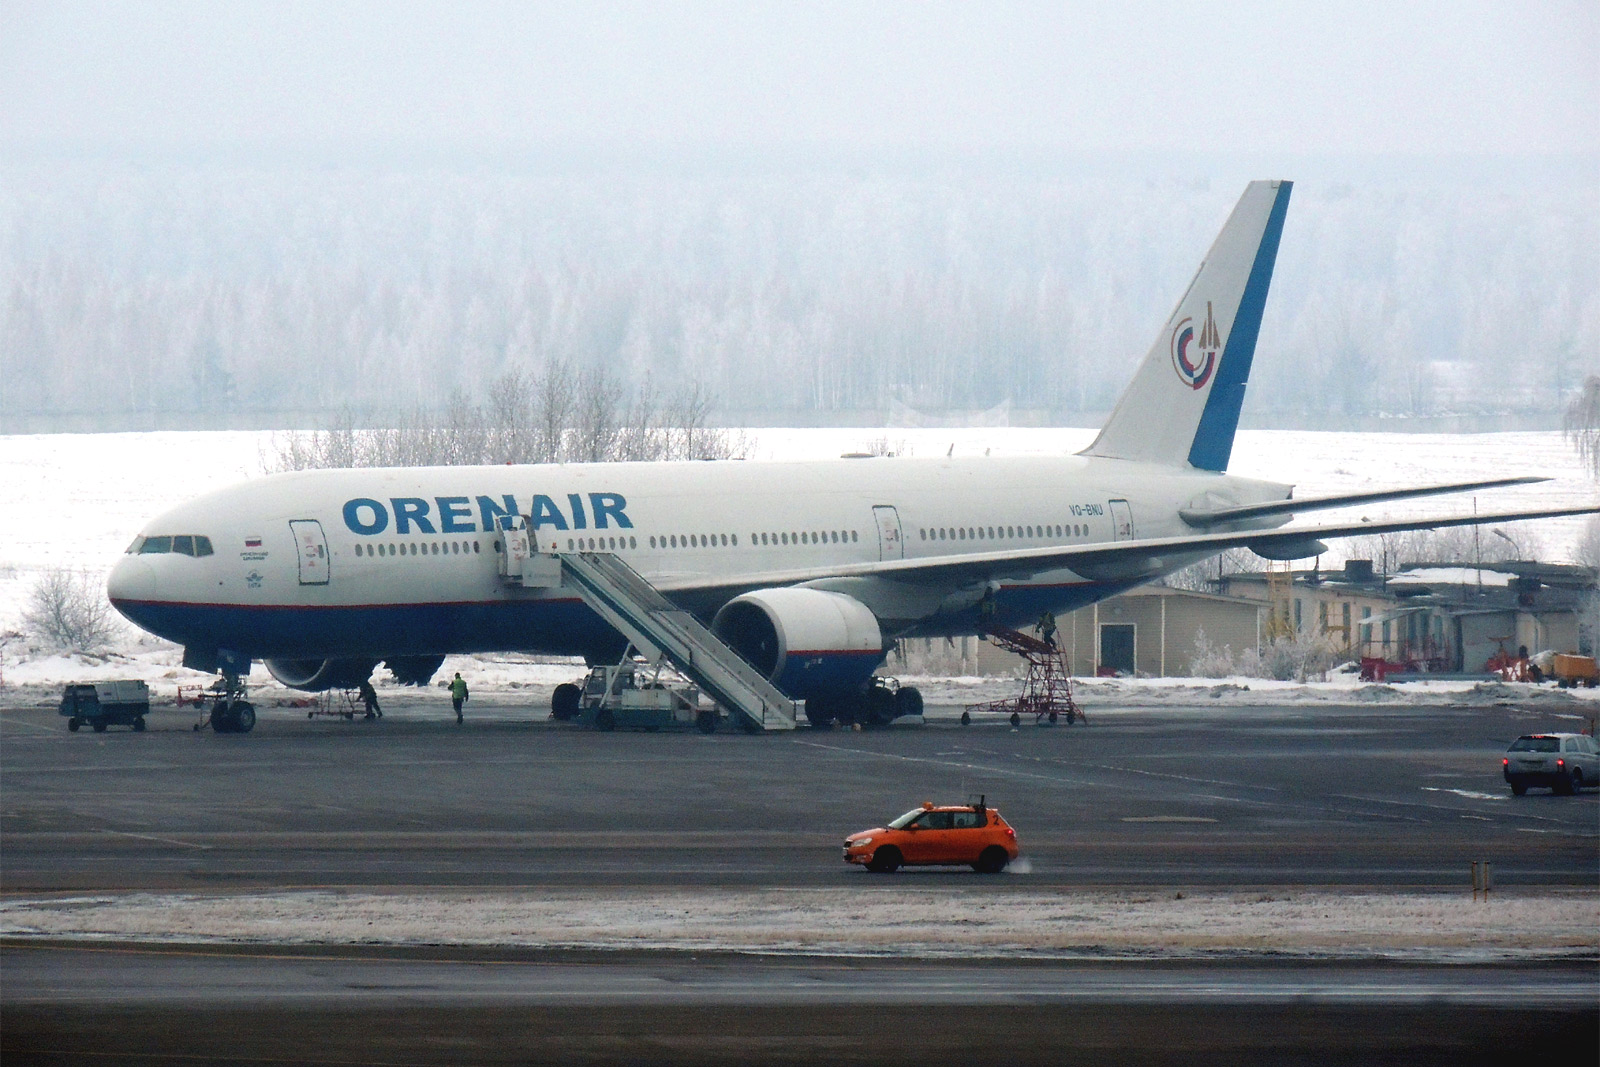 Боинг-777-200 Оренбургских авиалиний в аэропорту Москва Домодедово